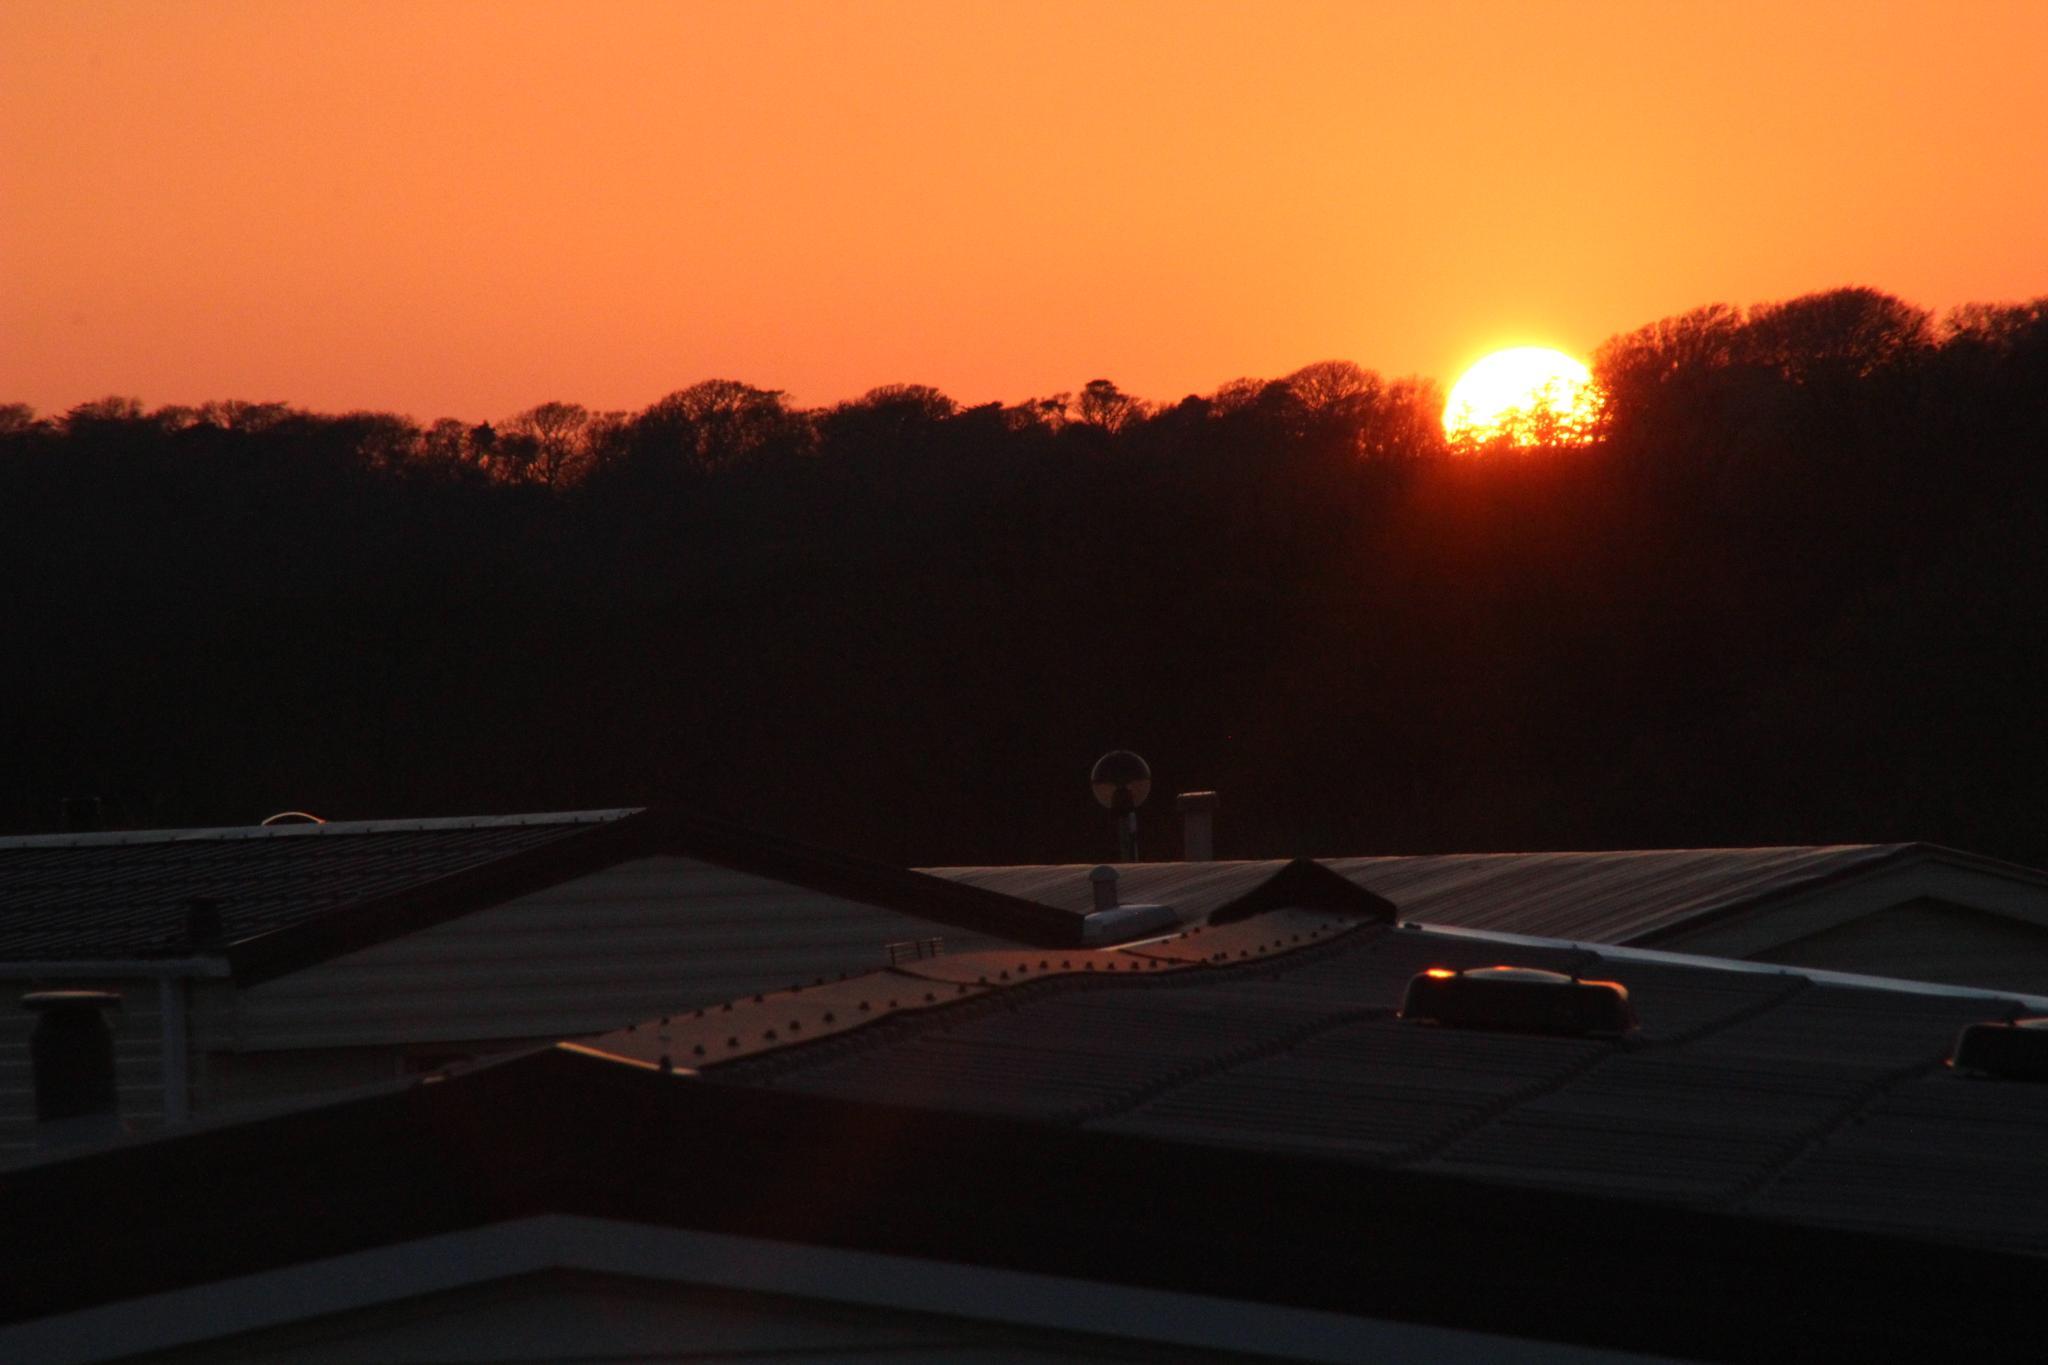 sundown by johnsmith93